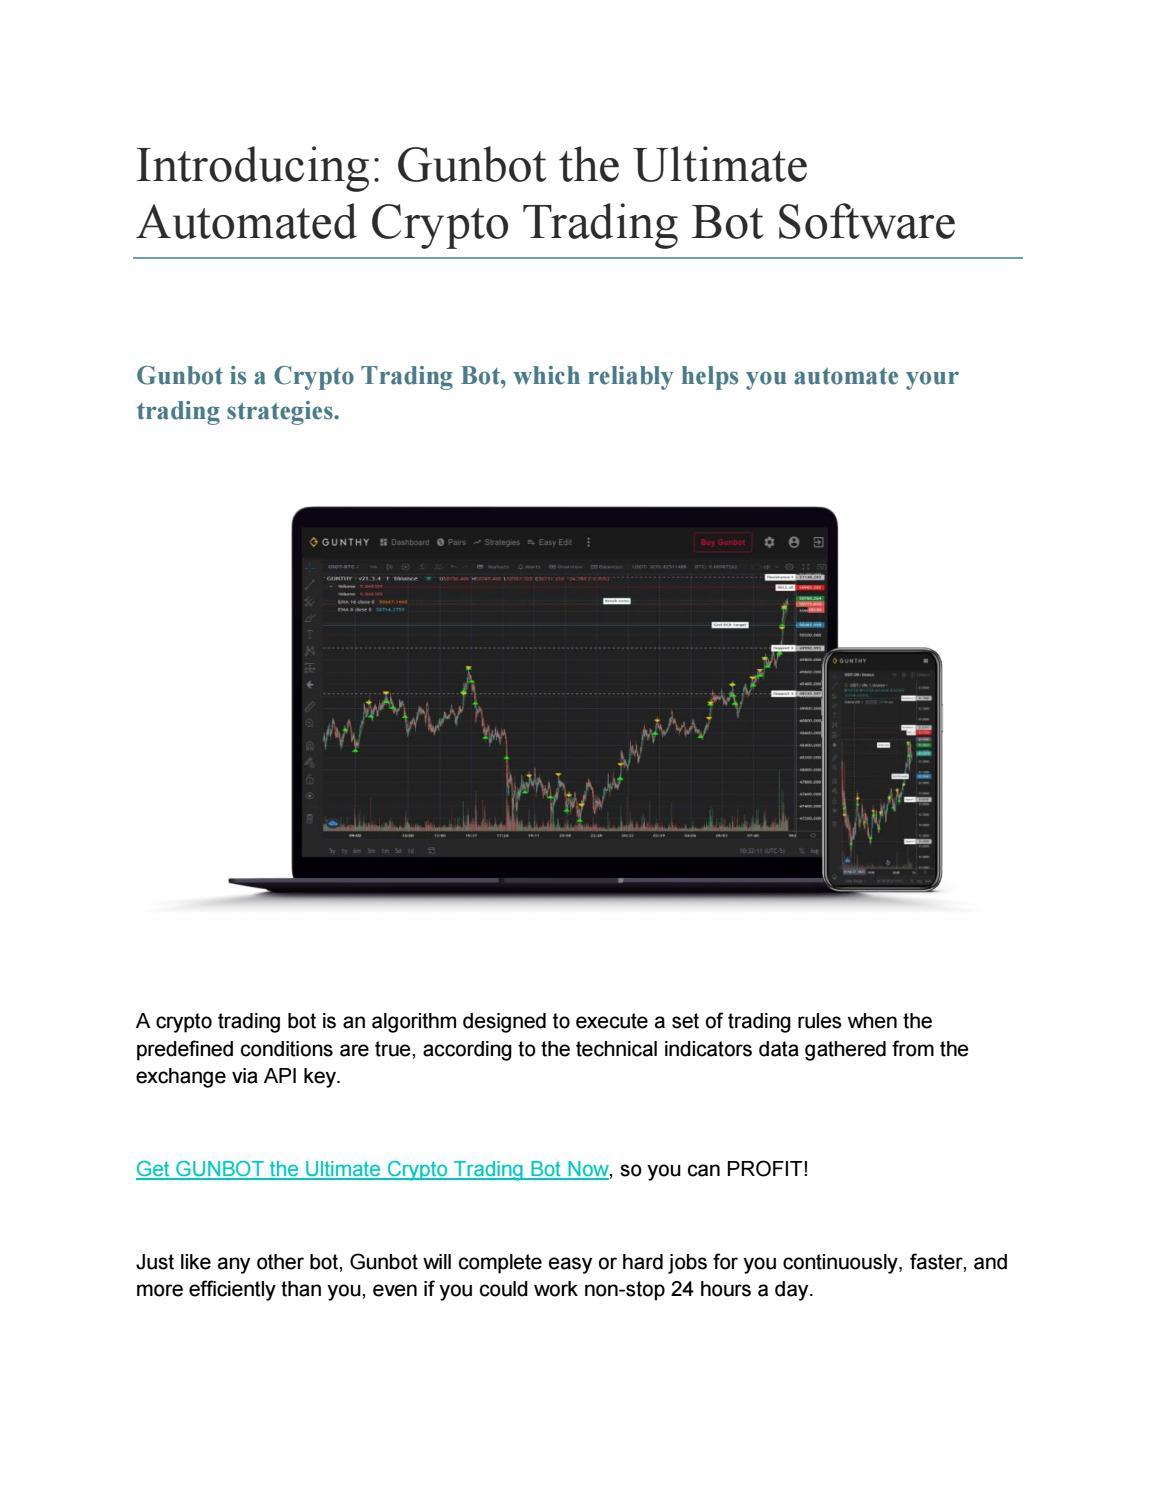 crypto trader vs gunbot bitcoin crește în prima zi de tranzacționare futures